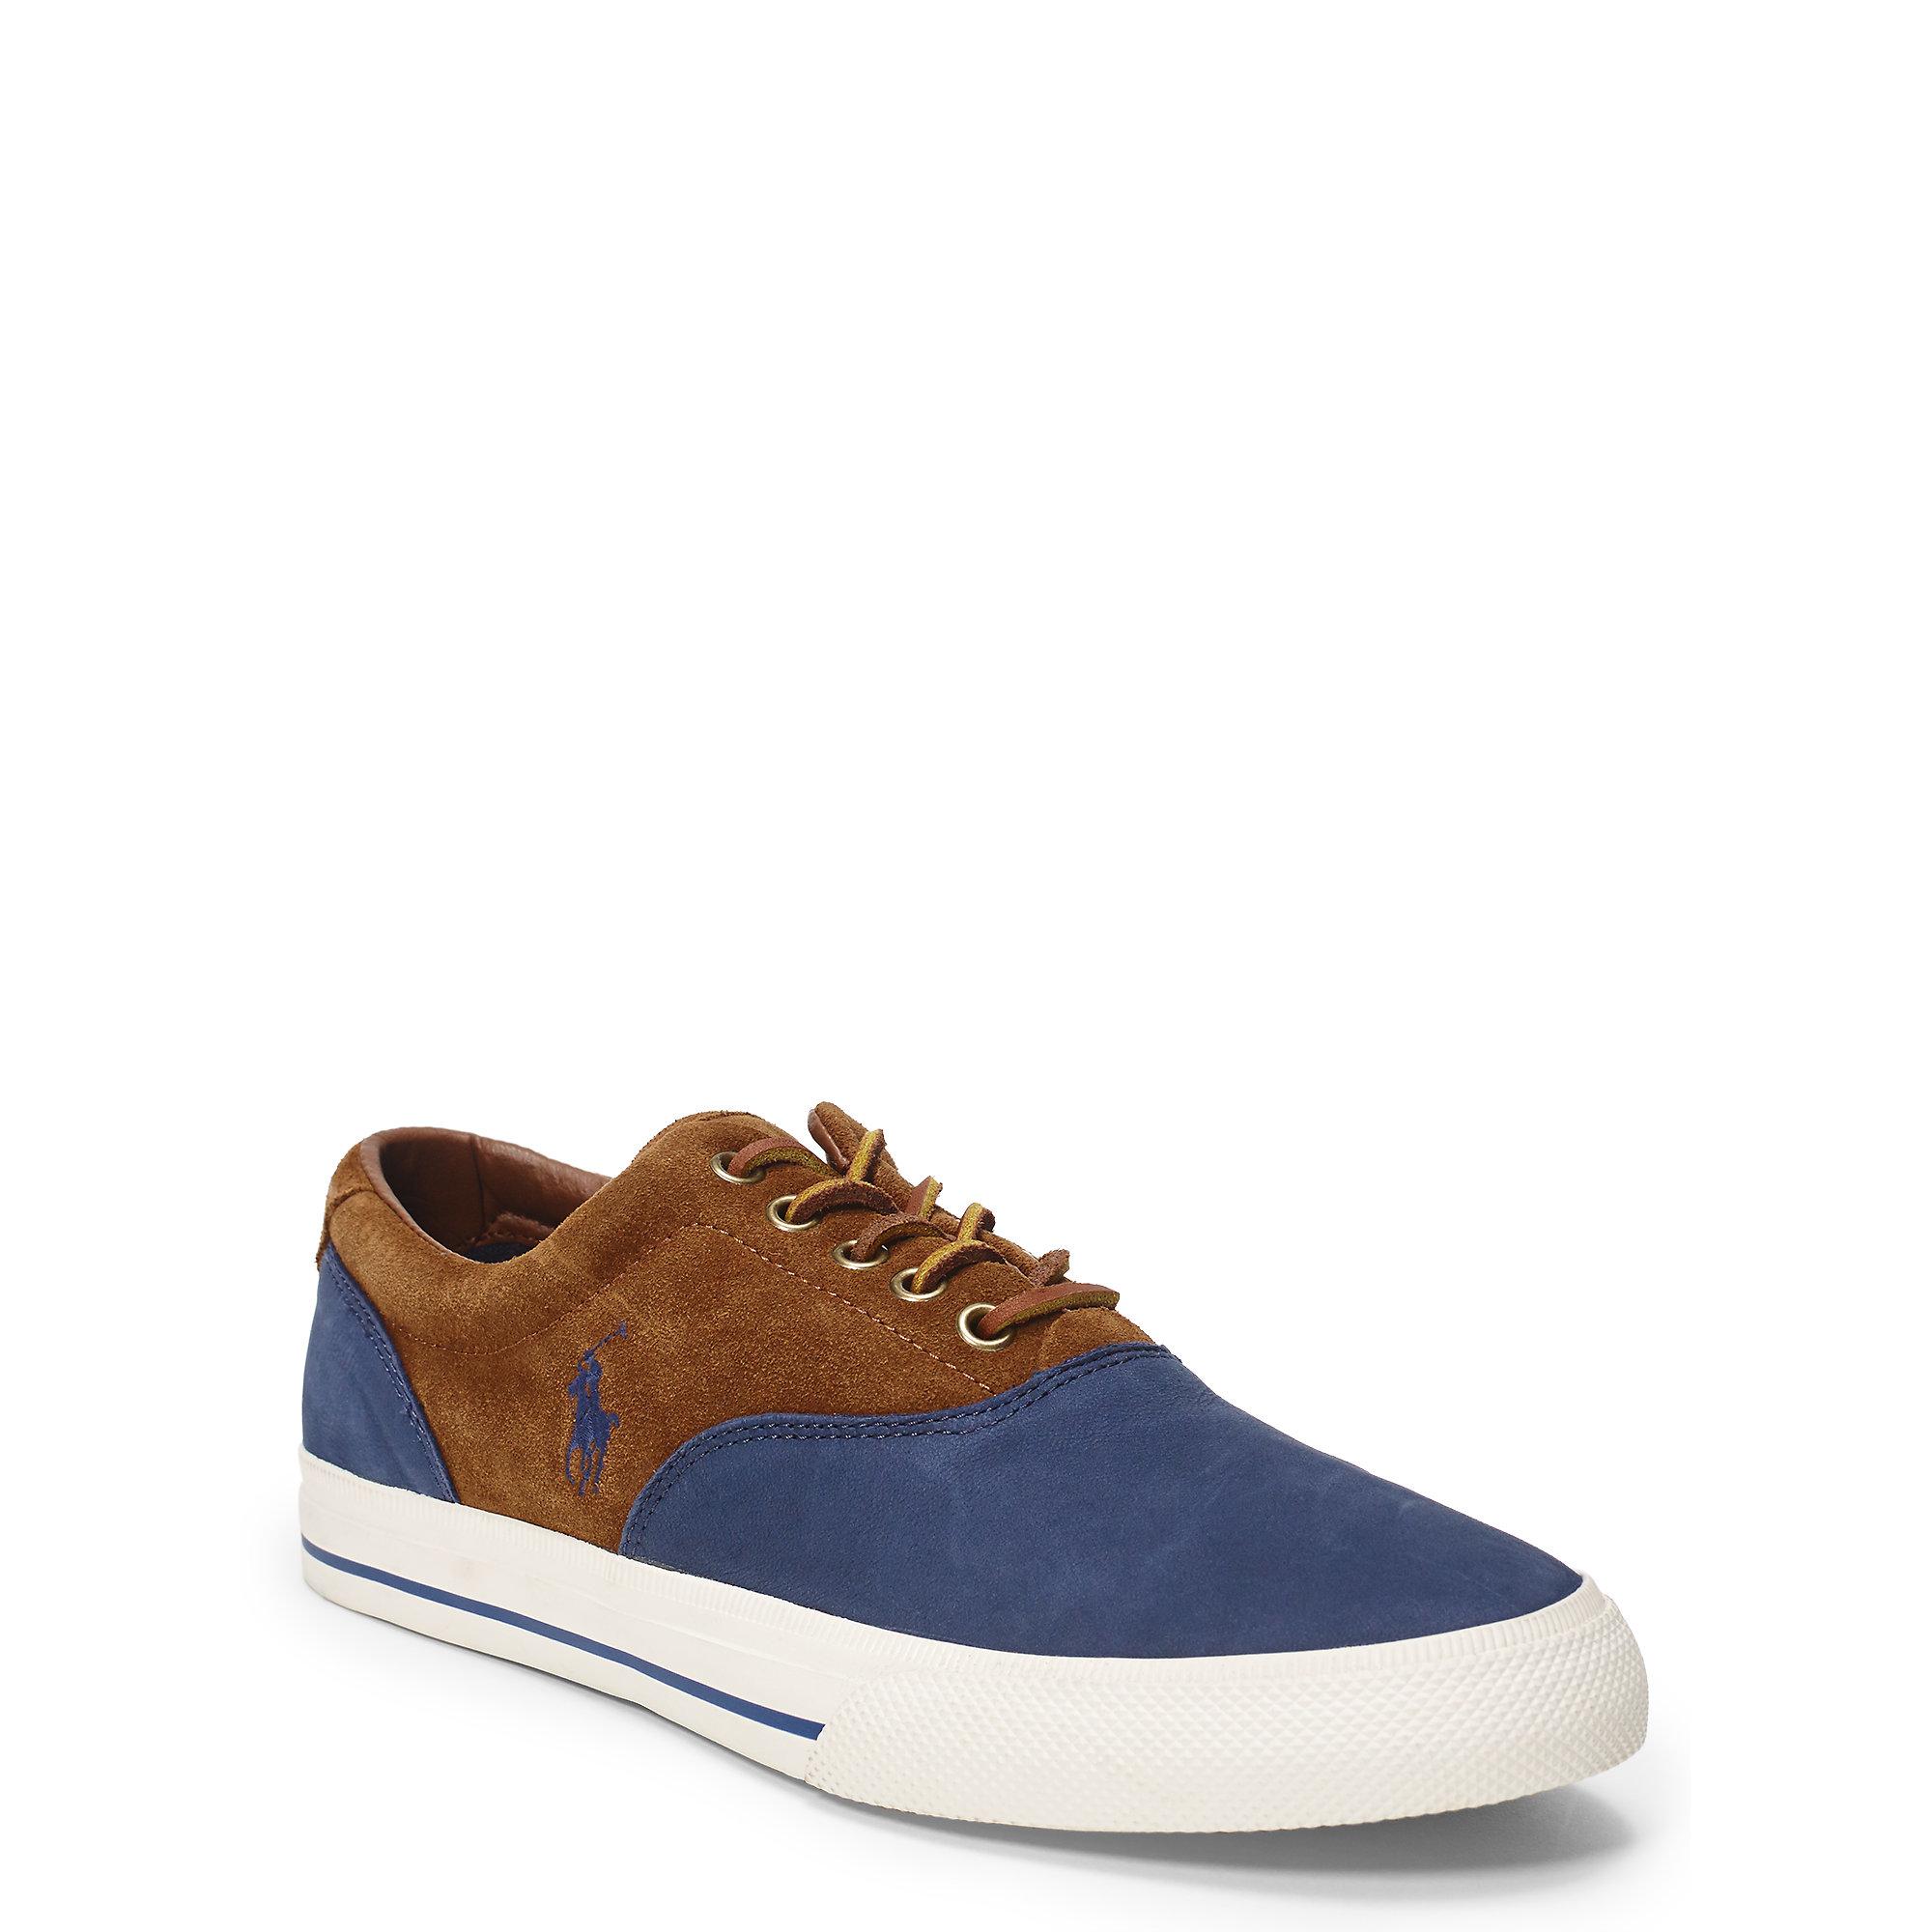 polo ralph lauren vaughn saddle suede sneaker in blue for men lyst. Black Bedroom Furniture Sets. Home Design Ideas